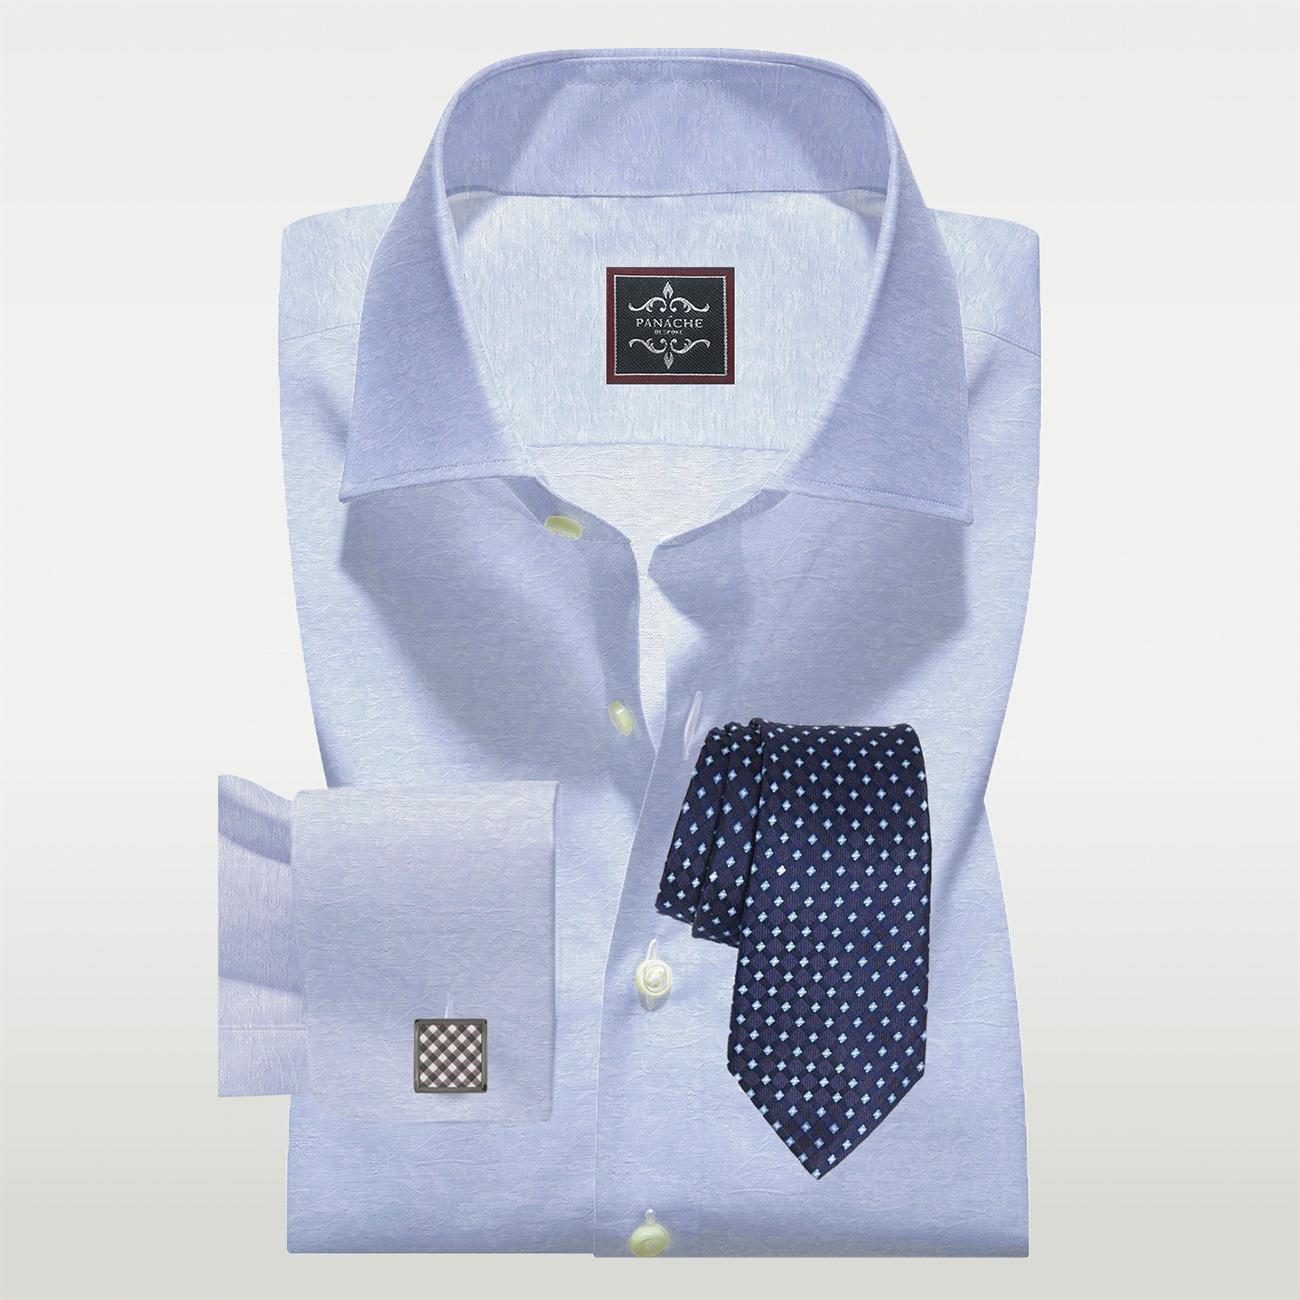 Custom Made Shirts Blue Floral